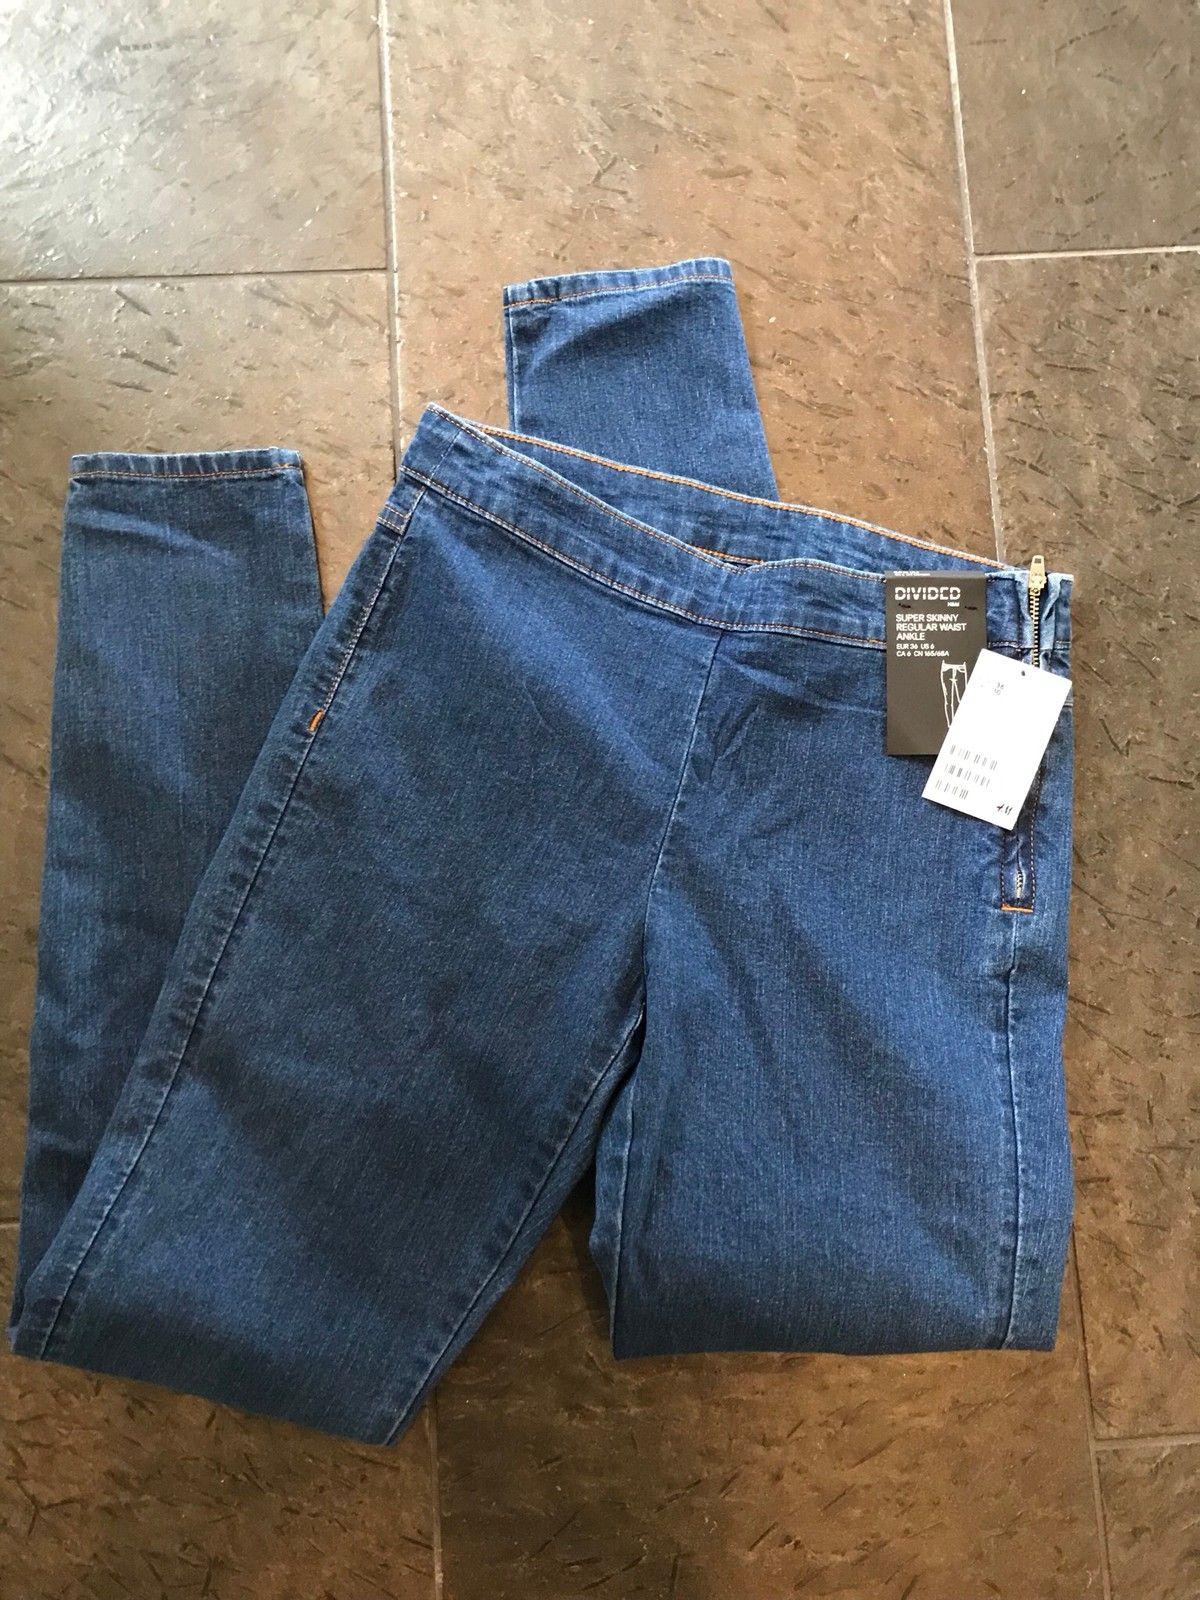 0c5551e6 H&M Divided jeans/tights, ubrukt | FINN.no